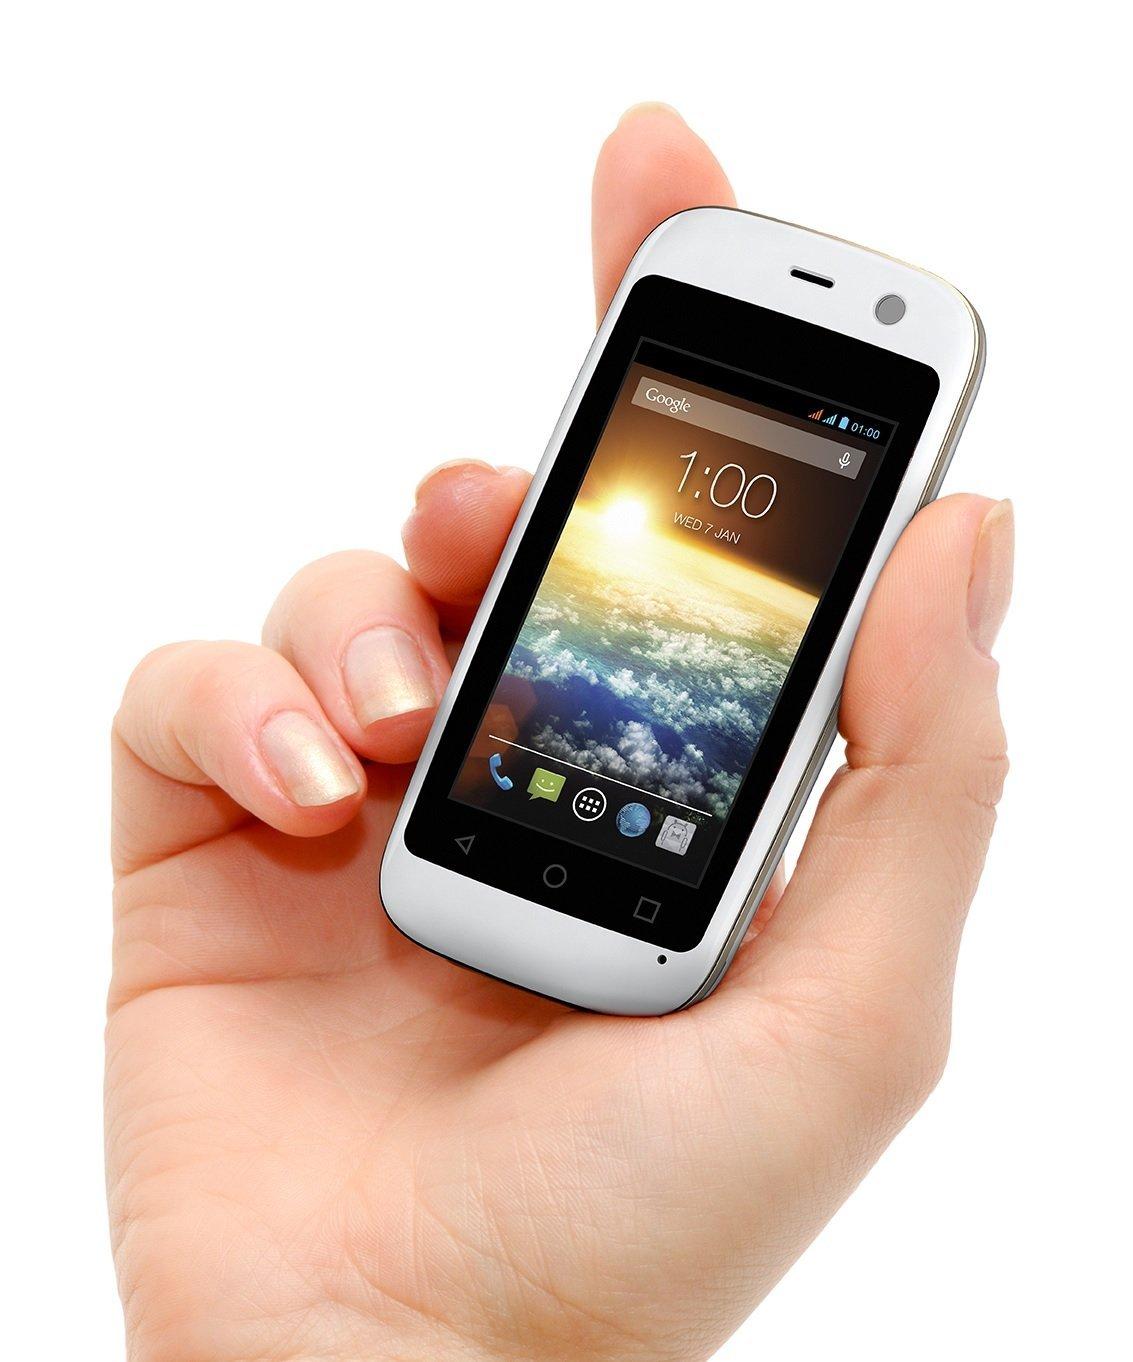 Smartphone Micro X Jadi Smartphone 4g Terkecil Bengkel Samsung